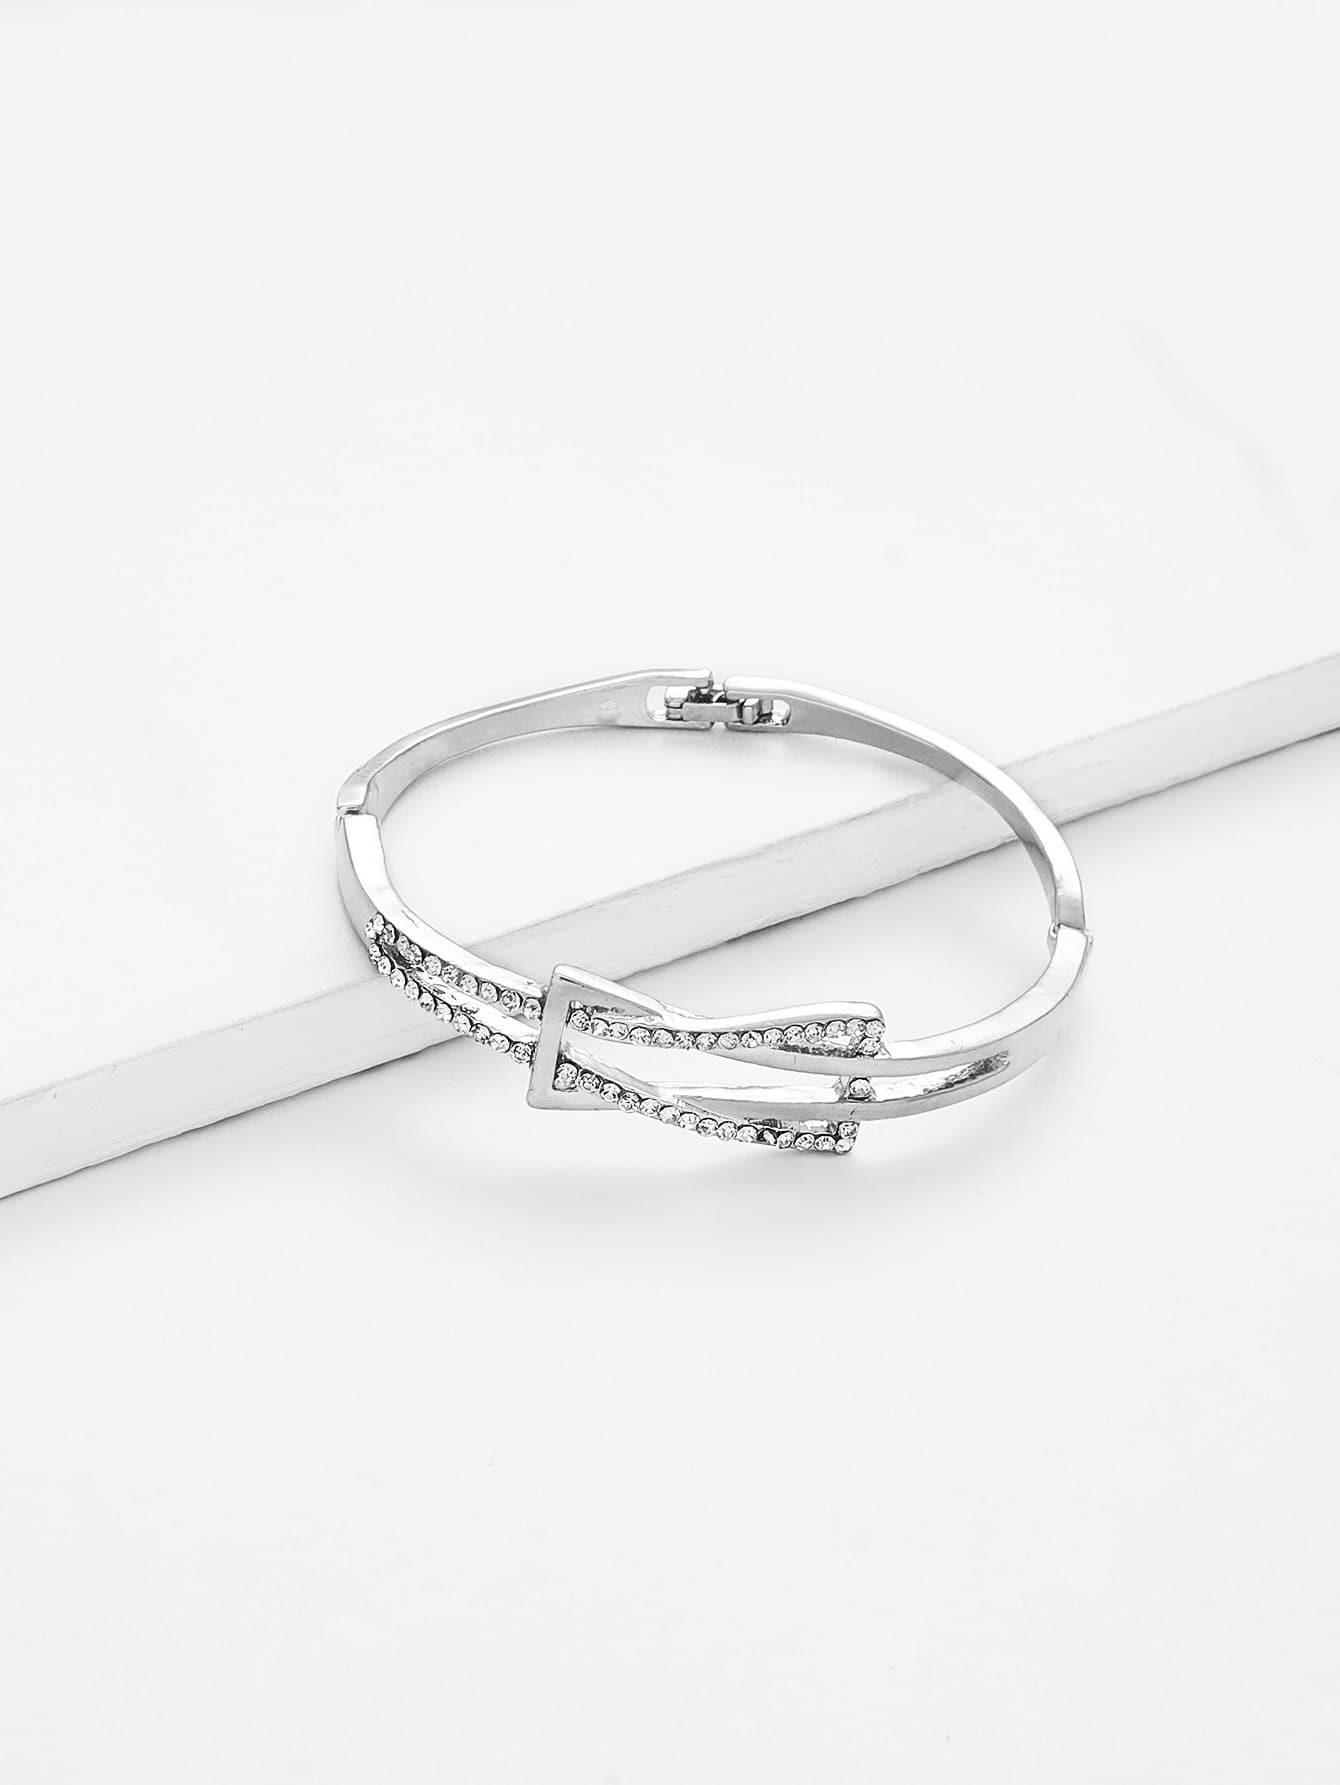 Rhinestone Detail Wrap Bangle Bracelet